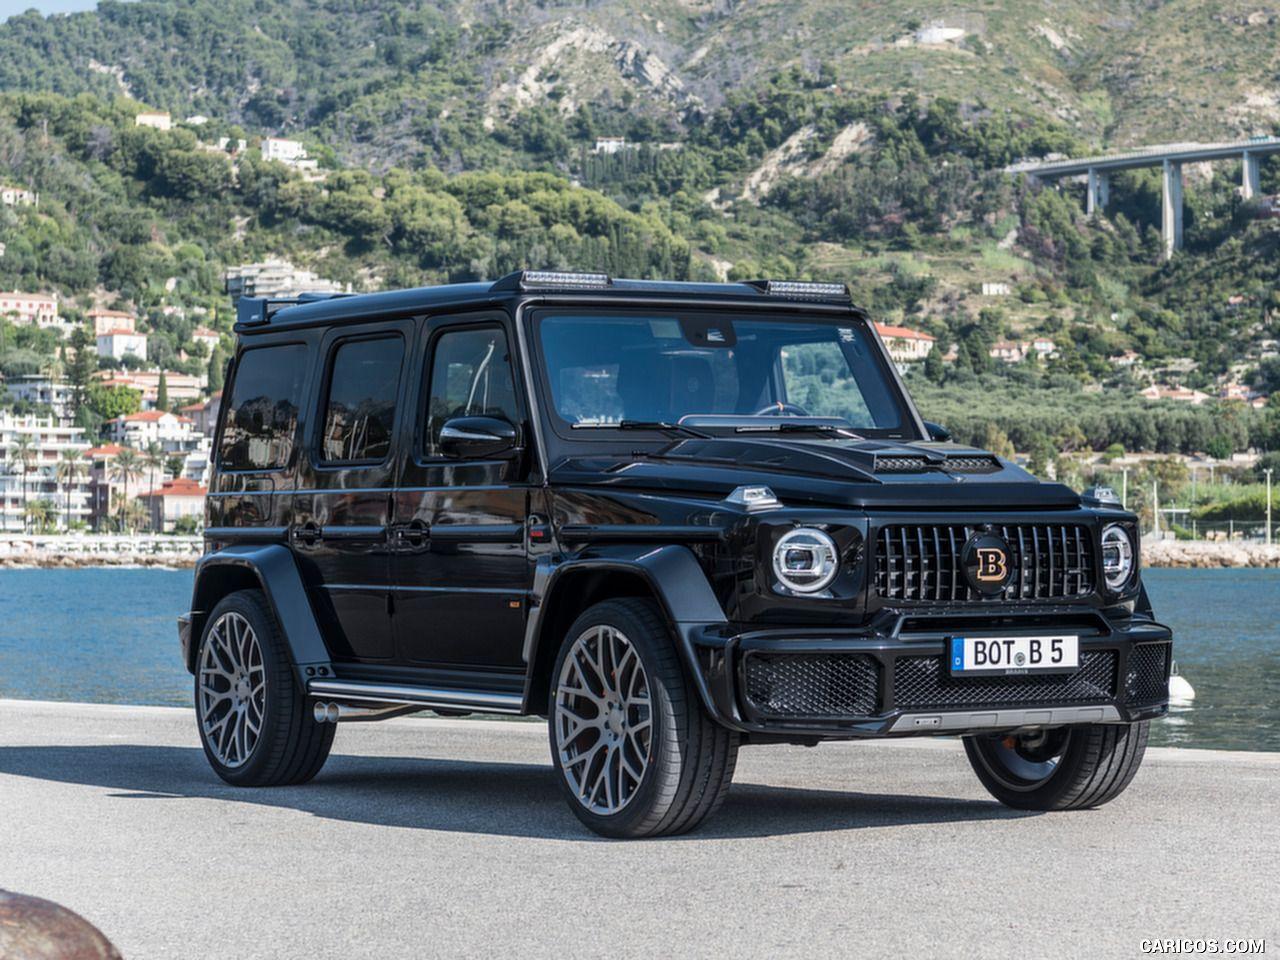 2019 Brabus 700 Widestar Based On Mercedes Amg G 63 Mercedes Amg G63 Amg Mercedes